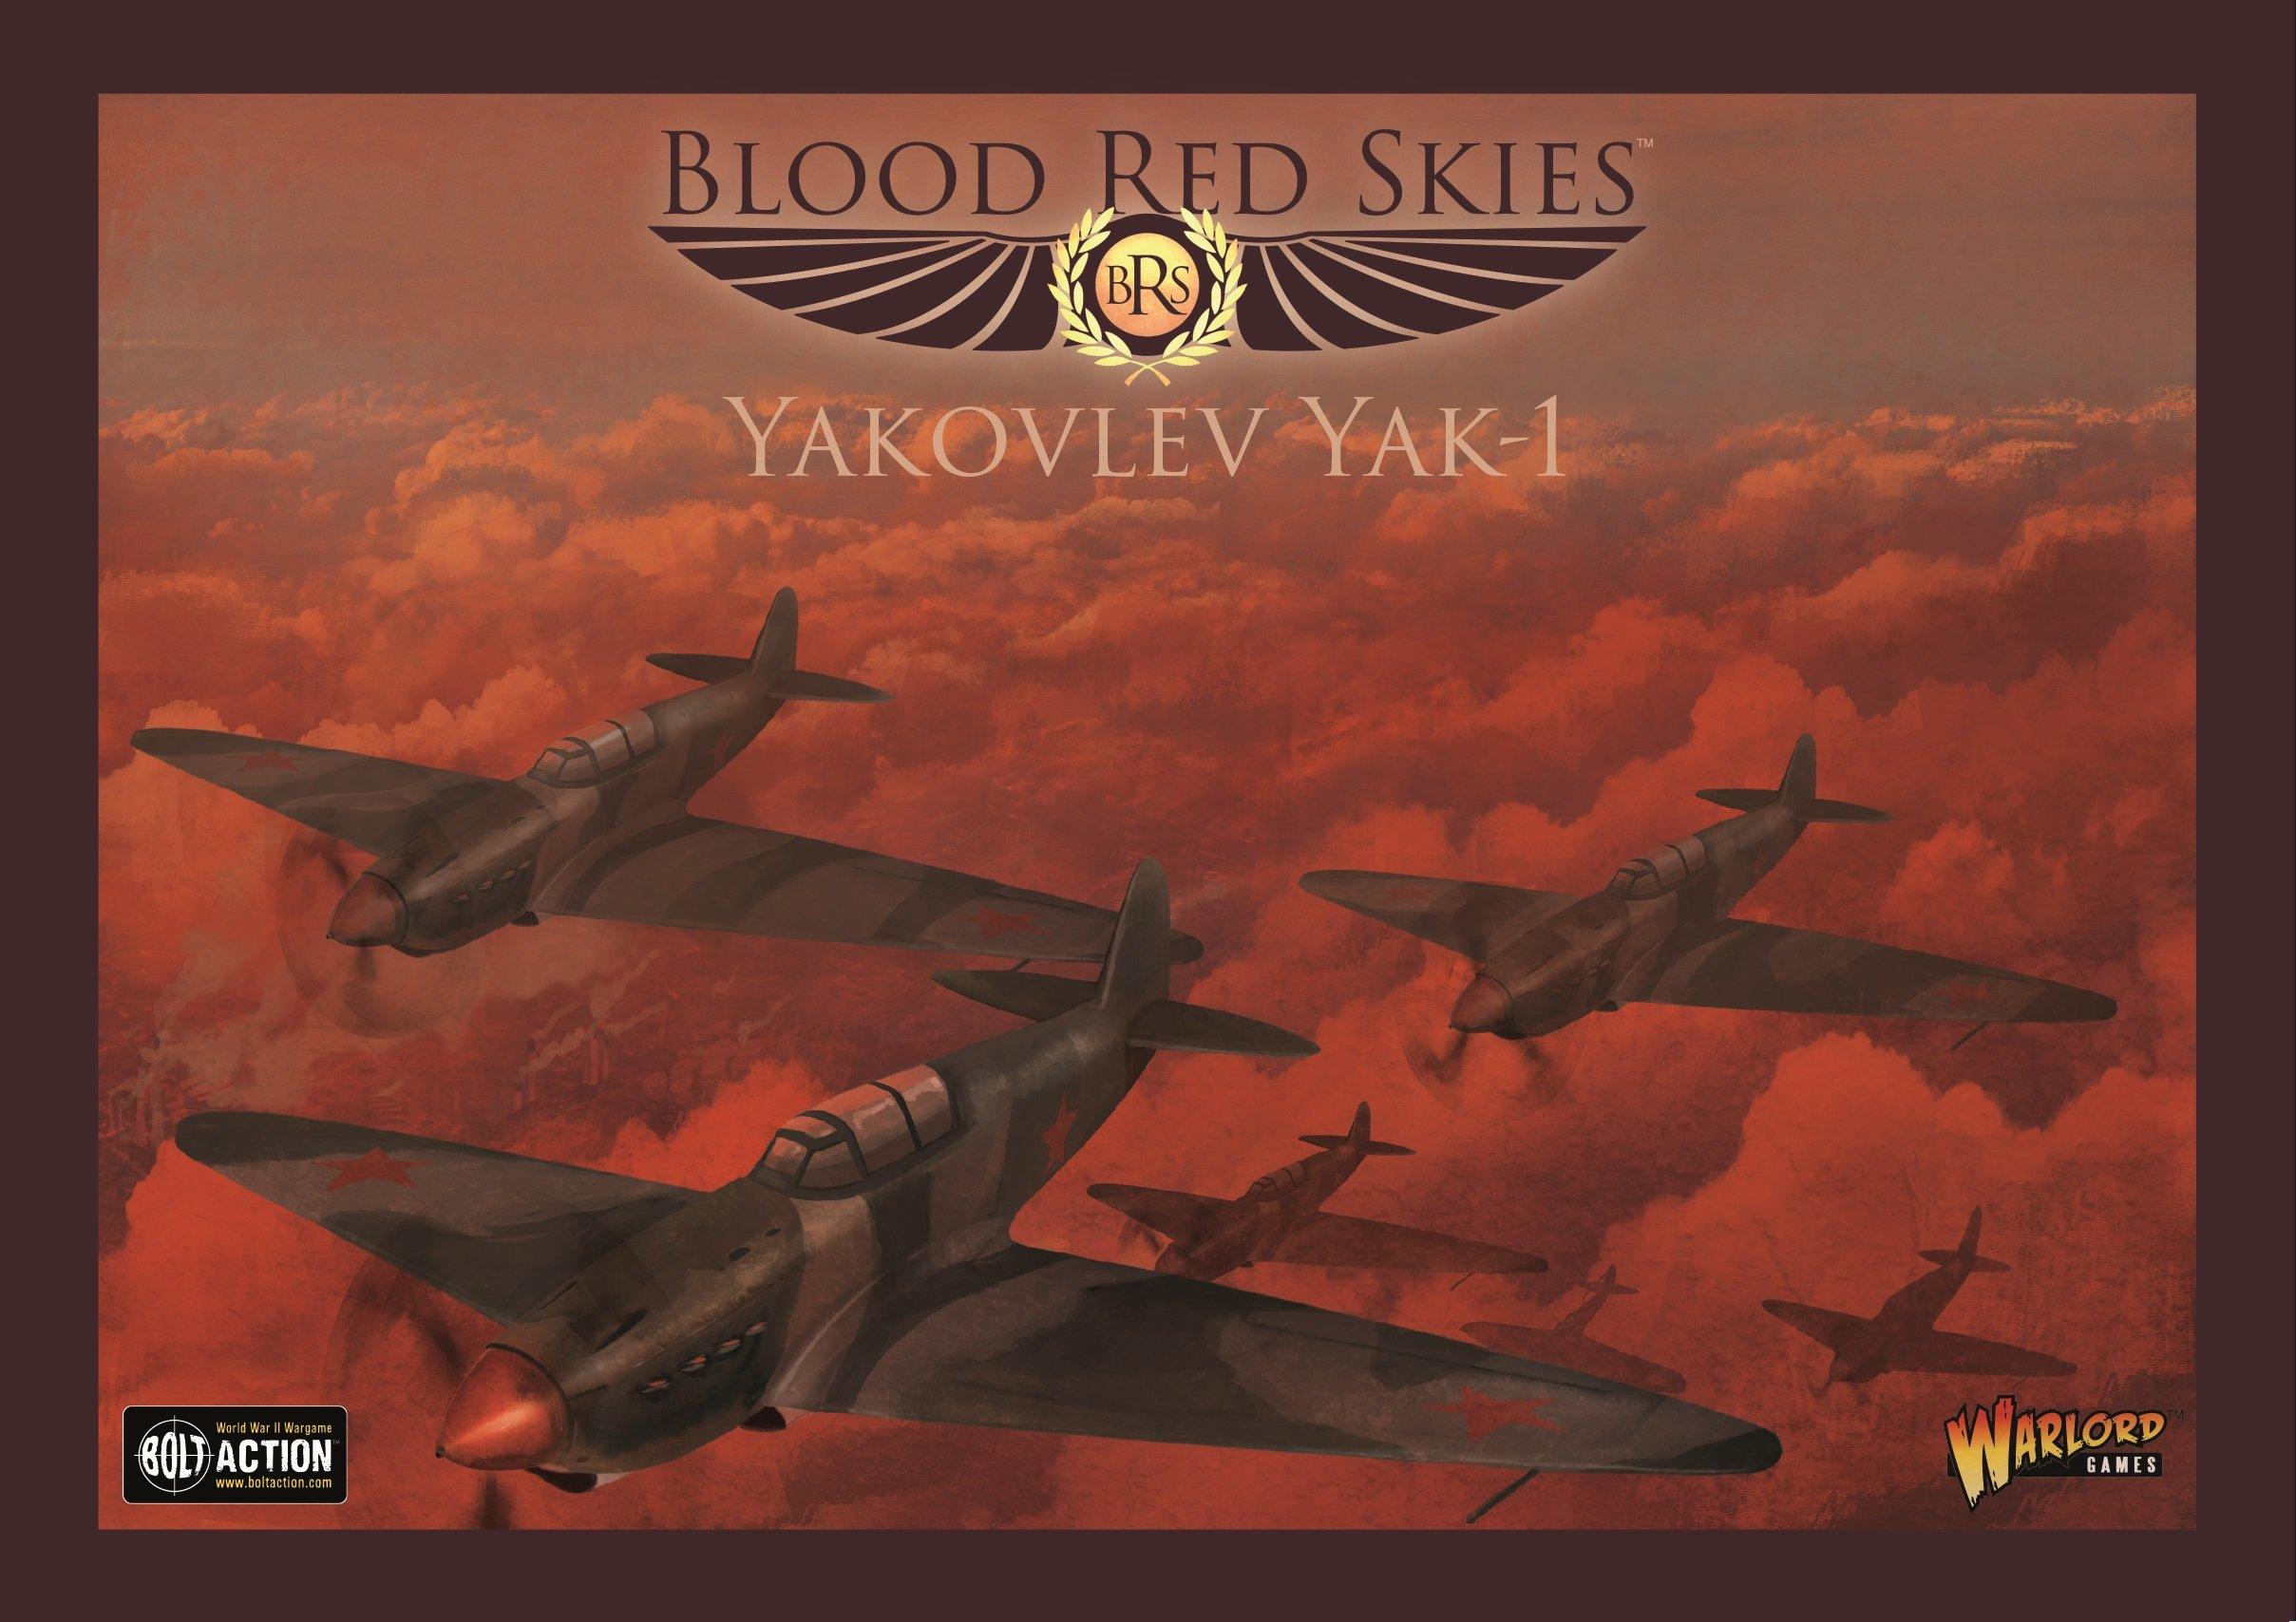 Warlord Games, Blood Red Skies - Yakovlew Yak-1 - Air Combat Game Miniatures